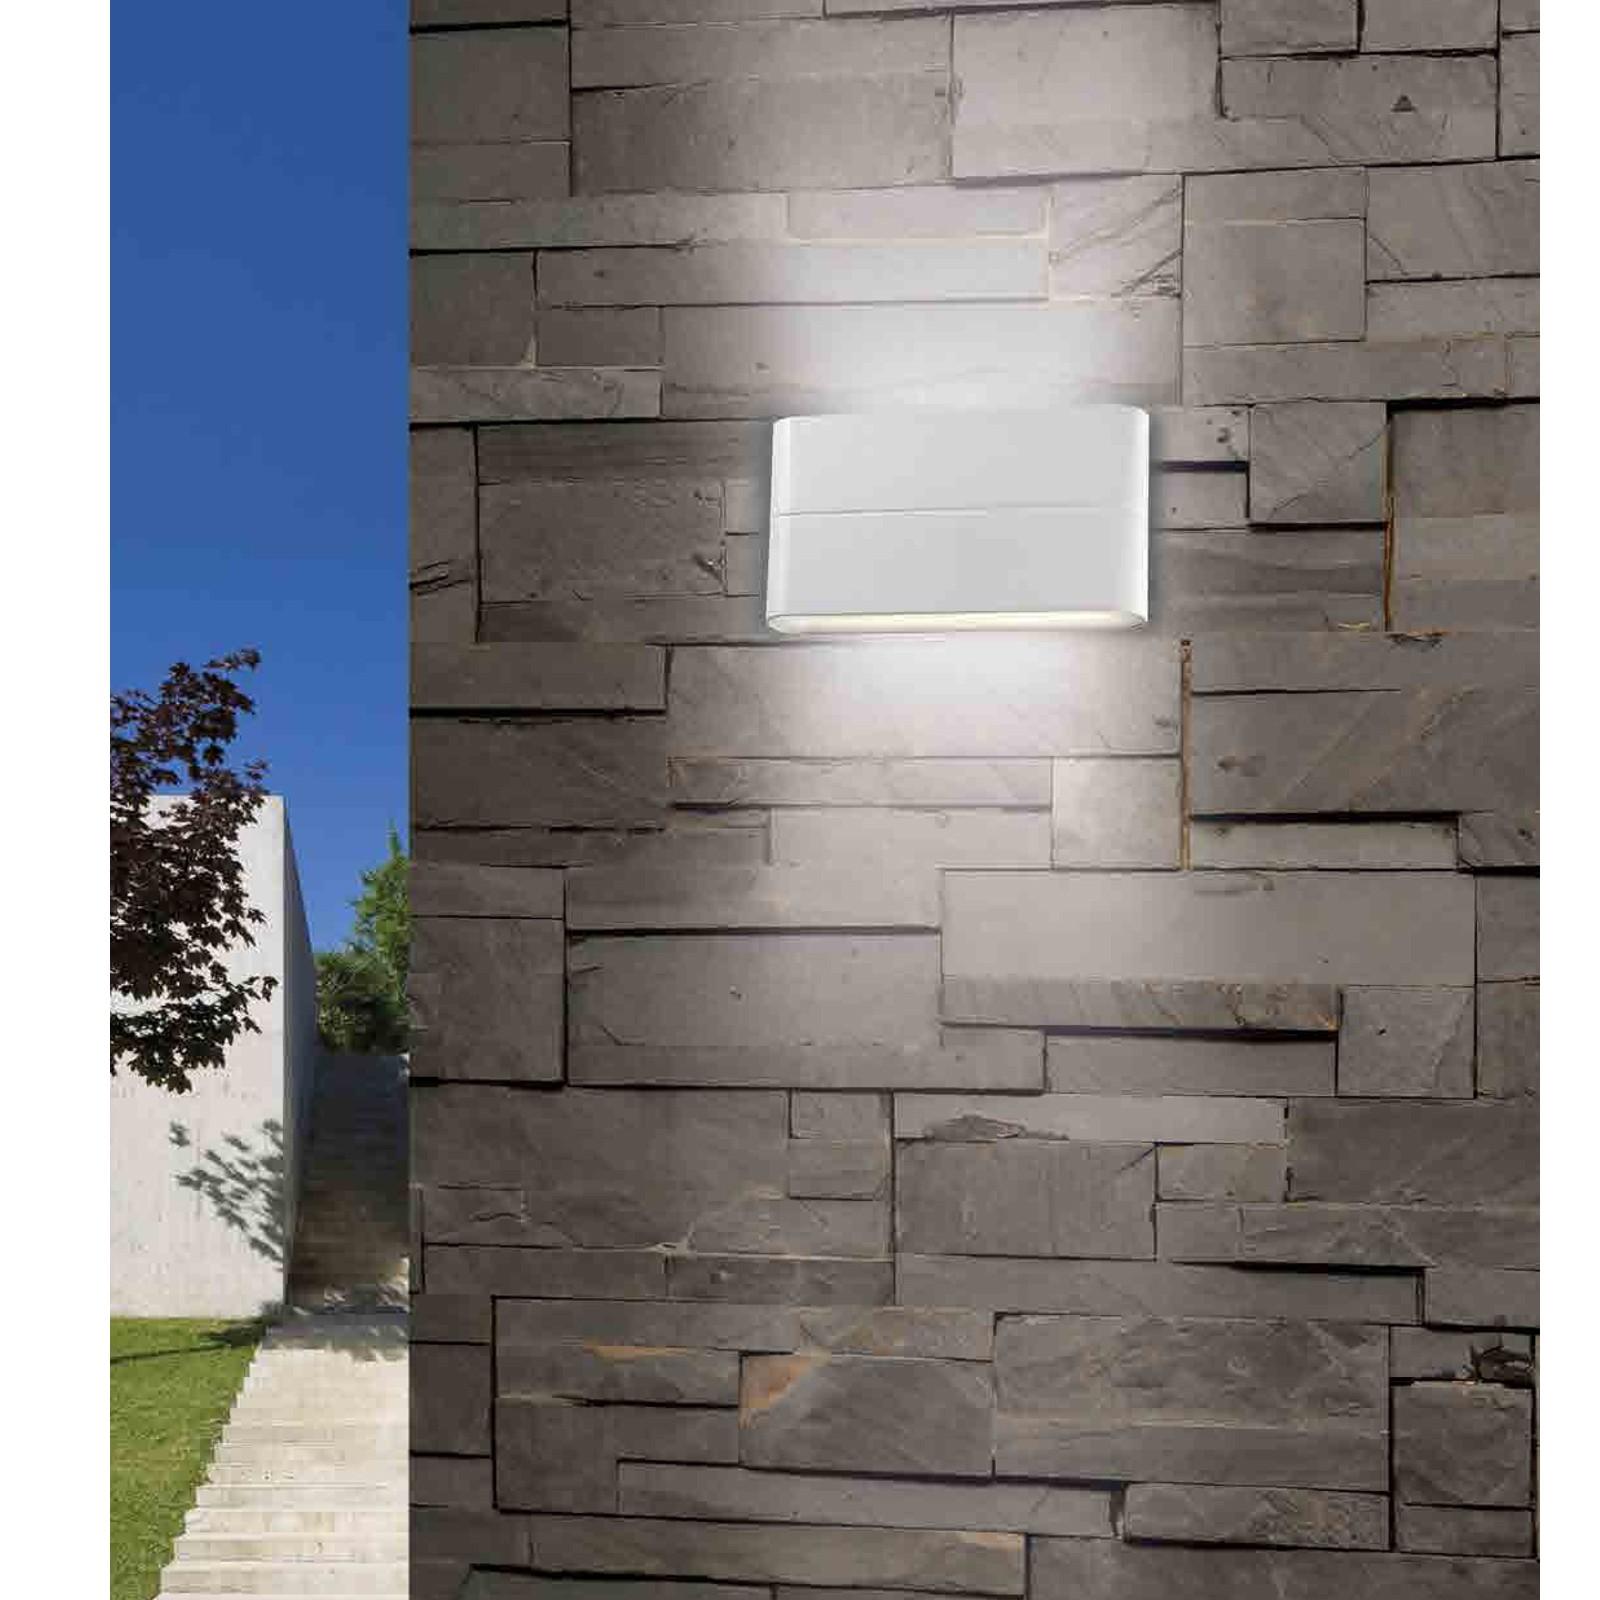 Lampada da esterno plafoniera applique a led parete pan - Plafoniere da esterno moderne ...